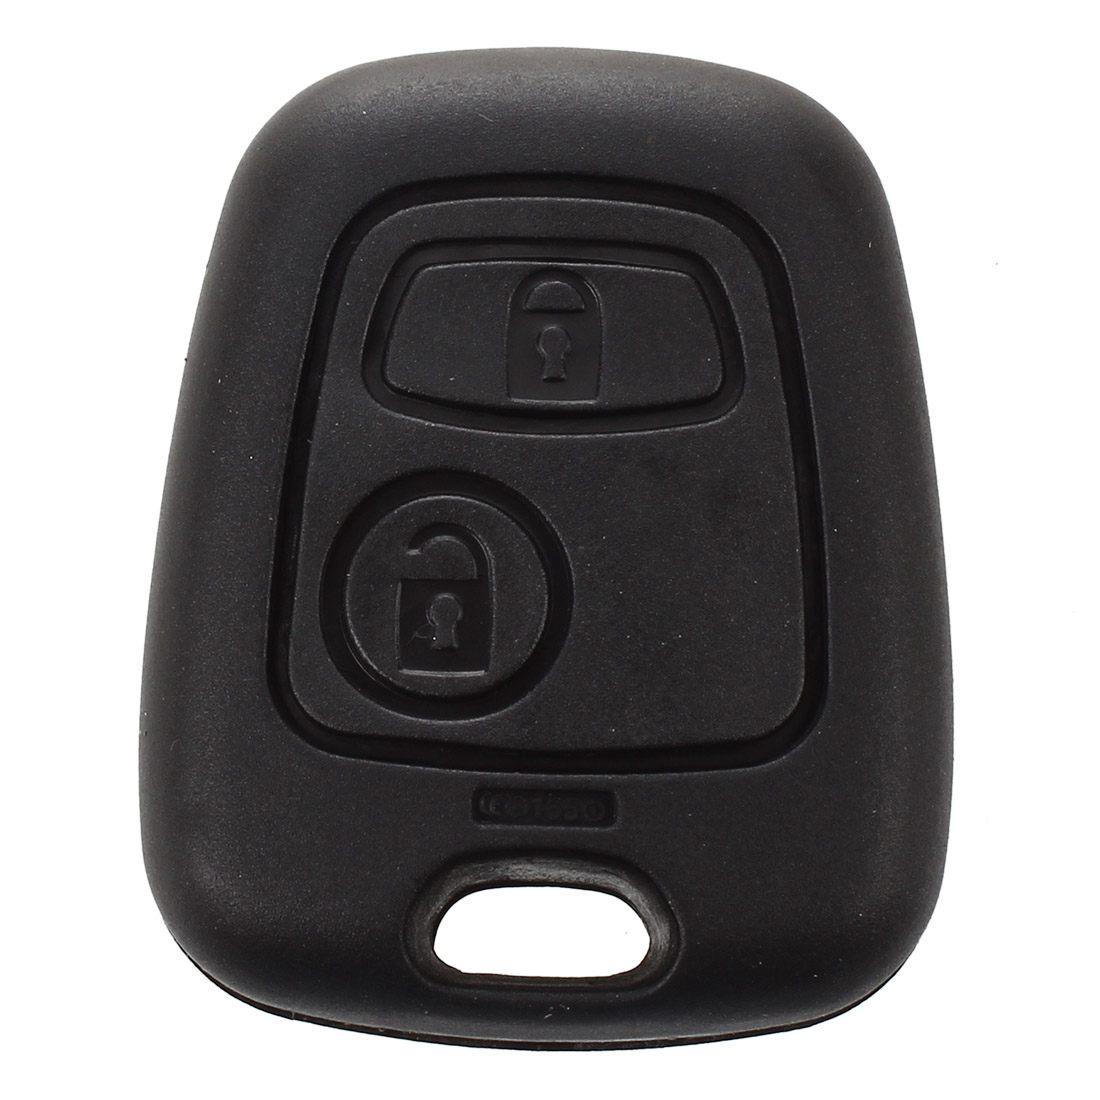 Jfbl Hot 2 Knop Afstandsbediening Sleutel Geval Shell Voor Citroen C1-c4 Peugeot 107 207 307 407 206 306